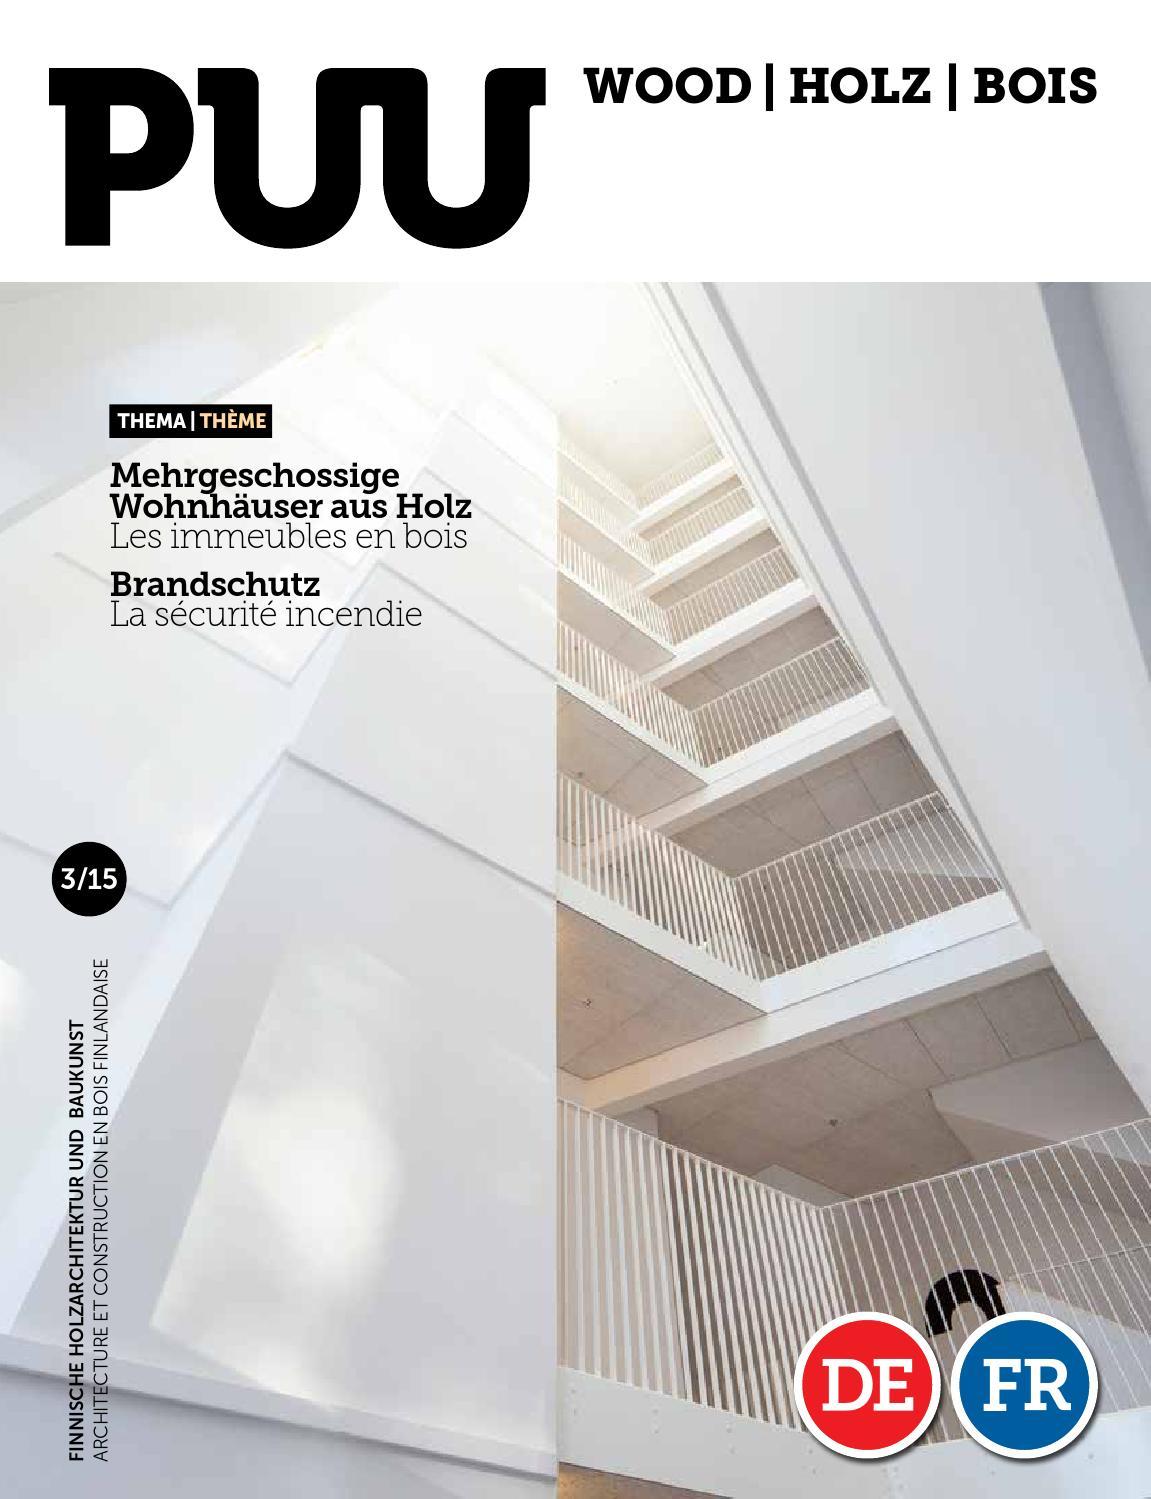 holzbois magazine 3 15 by puu lehti wood magazine holz magazin bois magazine issuu. Black Bedroom Furniture Sets. Home Design Ideas